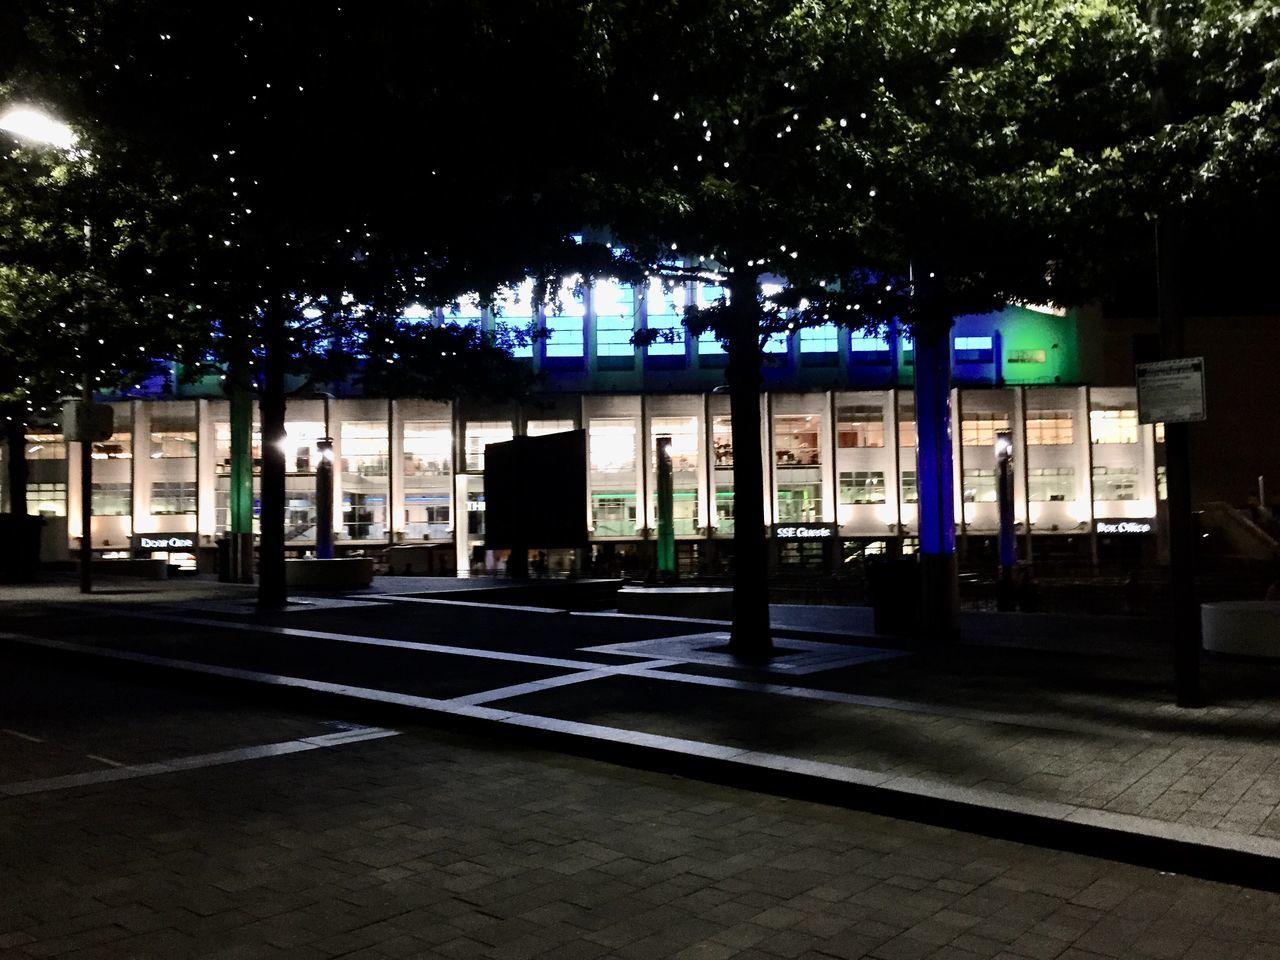 Wembley Wembleyarena Xfactor Night Check This Out Nightphotography Light Enjoying Life Summer Evening